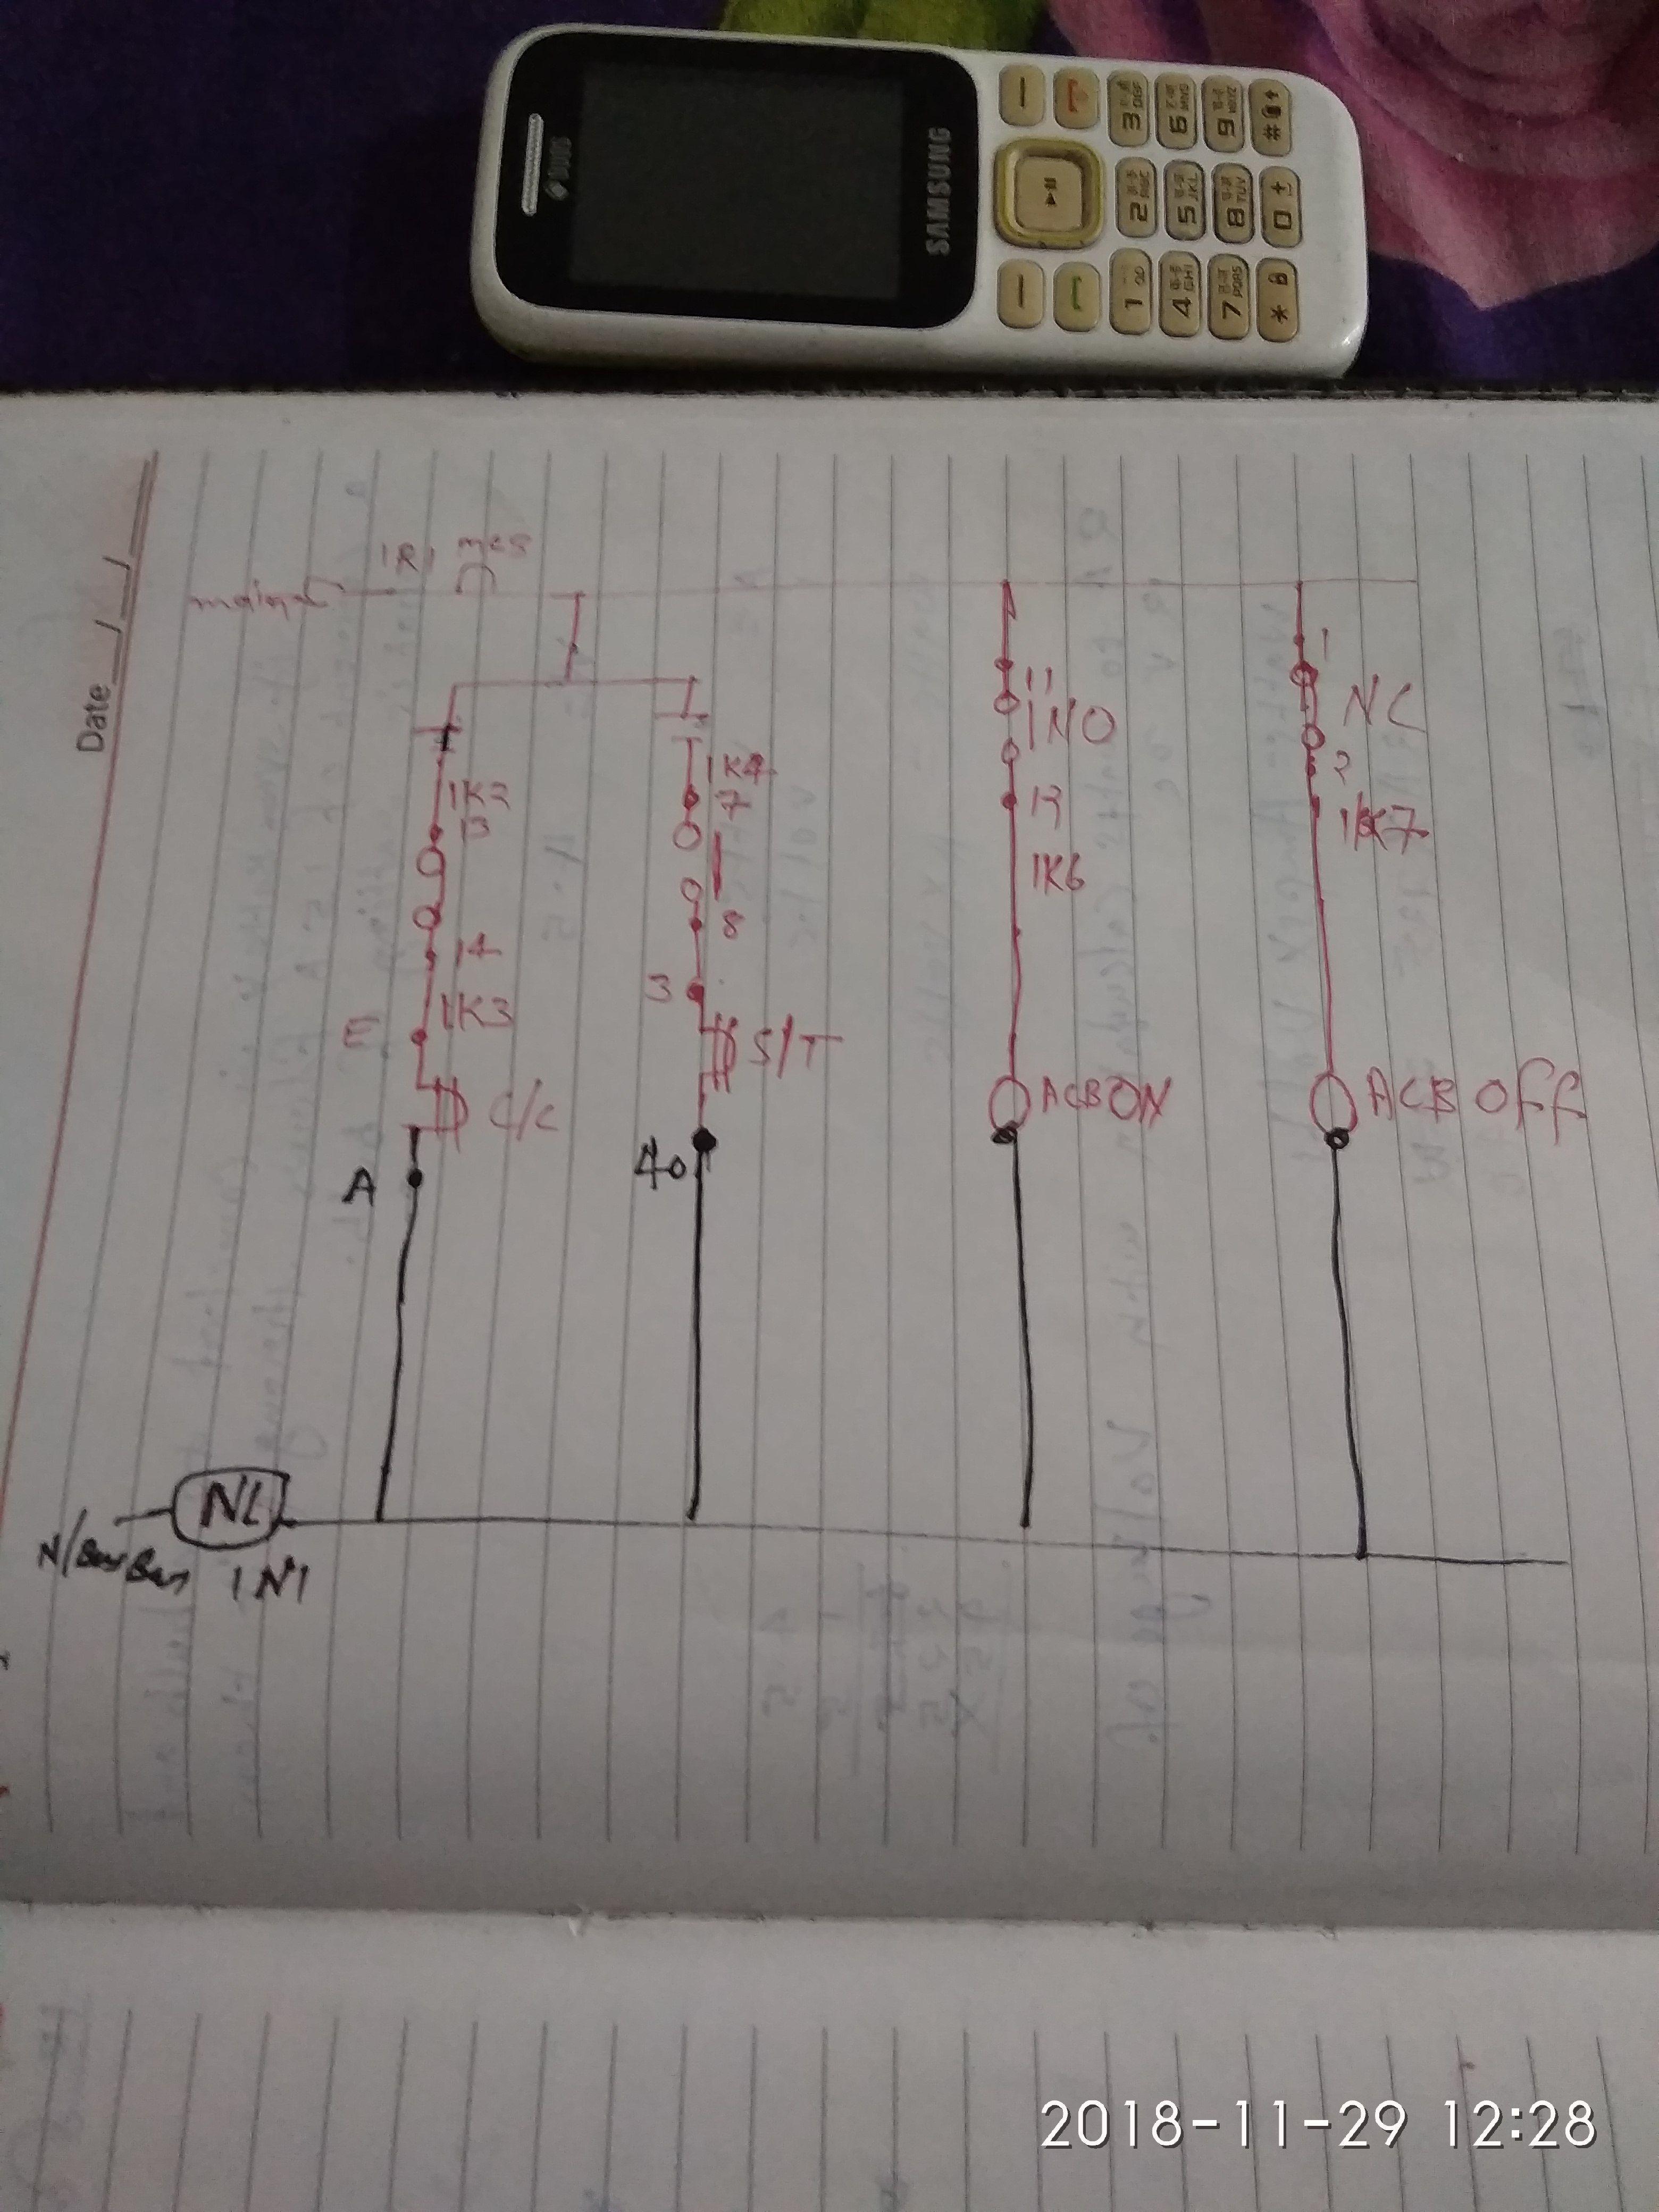 acb control wiring diagram [ 3120 x 4160 Pixel ]